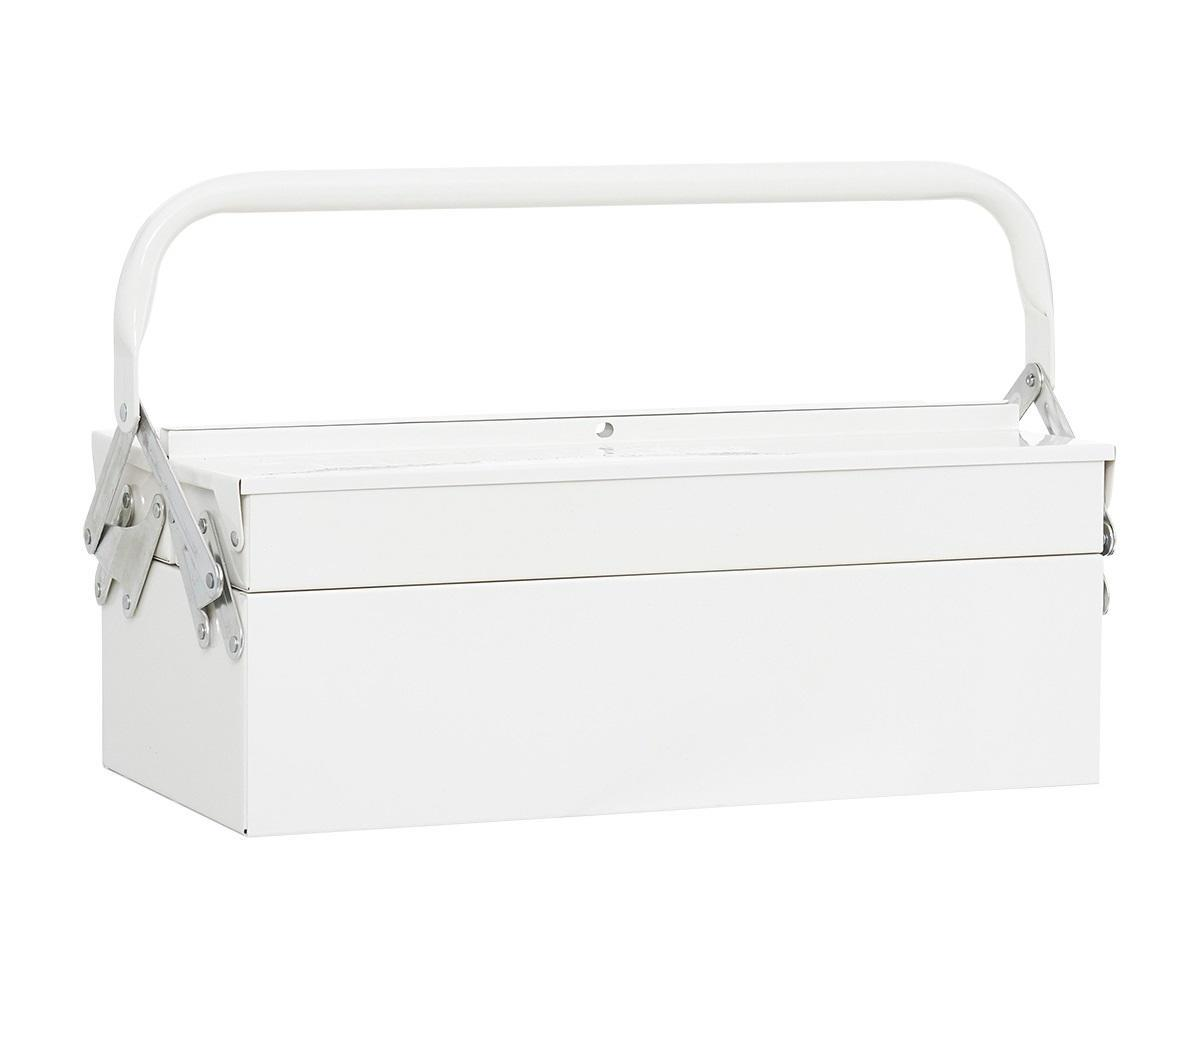 House Doctor Kufřík na nářadí White, bílá barva, kov